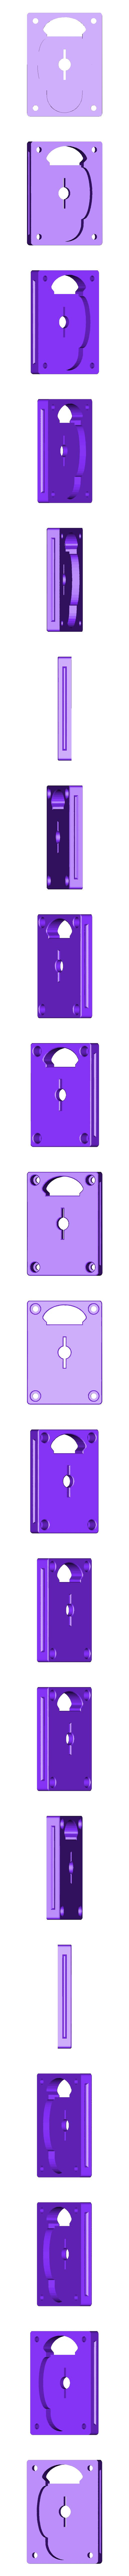 Bismouth Base-Steven Universe.STL Download STL file Bismuth GEM from Steven Universe, Wearable Plastic Crystal Gemstone Rainbow Color Prop, Bismouths Gems Costume, Cosplay, Comiccon, or Halloween • 3D printable design, mechengineermike